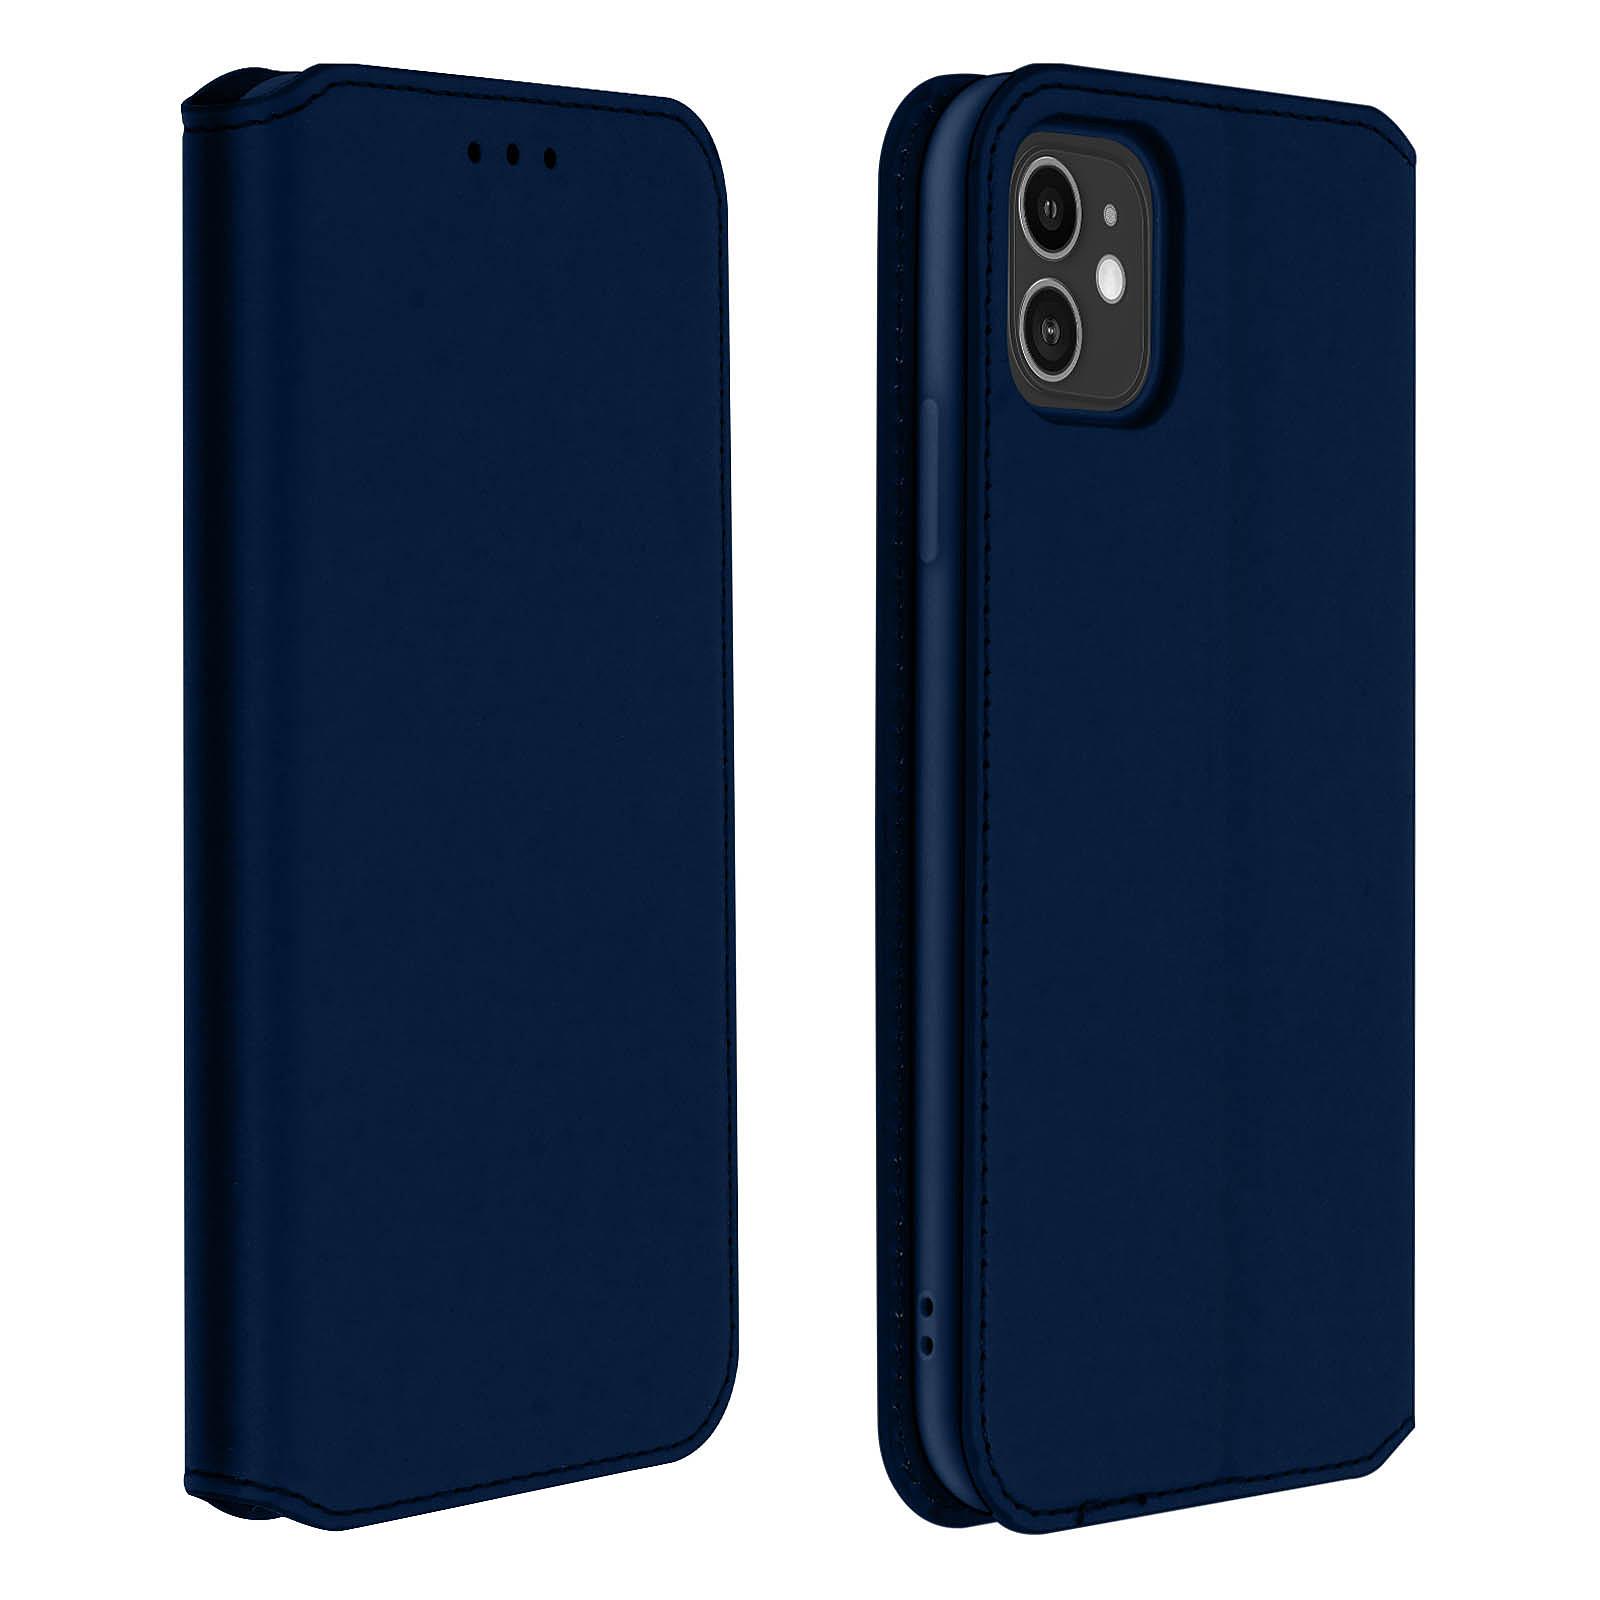 Avizar Etui folio Bleu Nuit Éco-cuir pour Apple iPhone 11